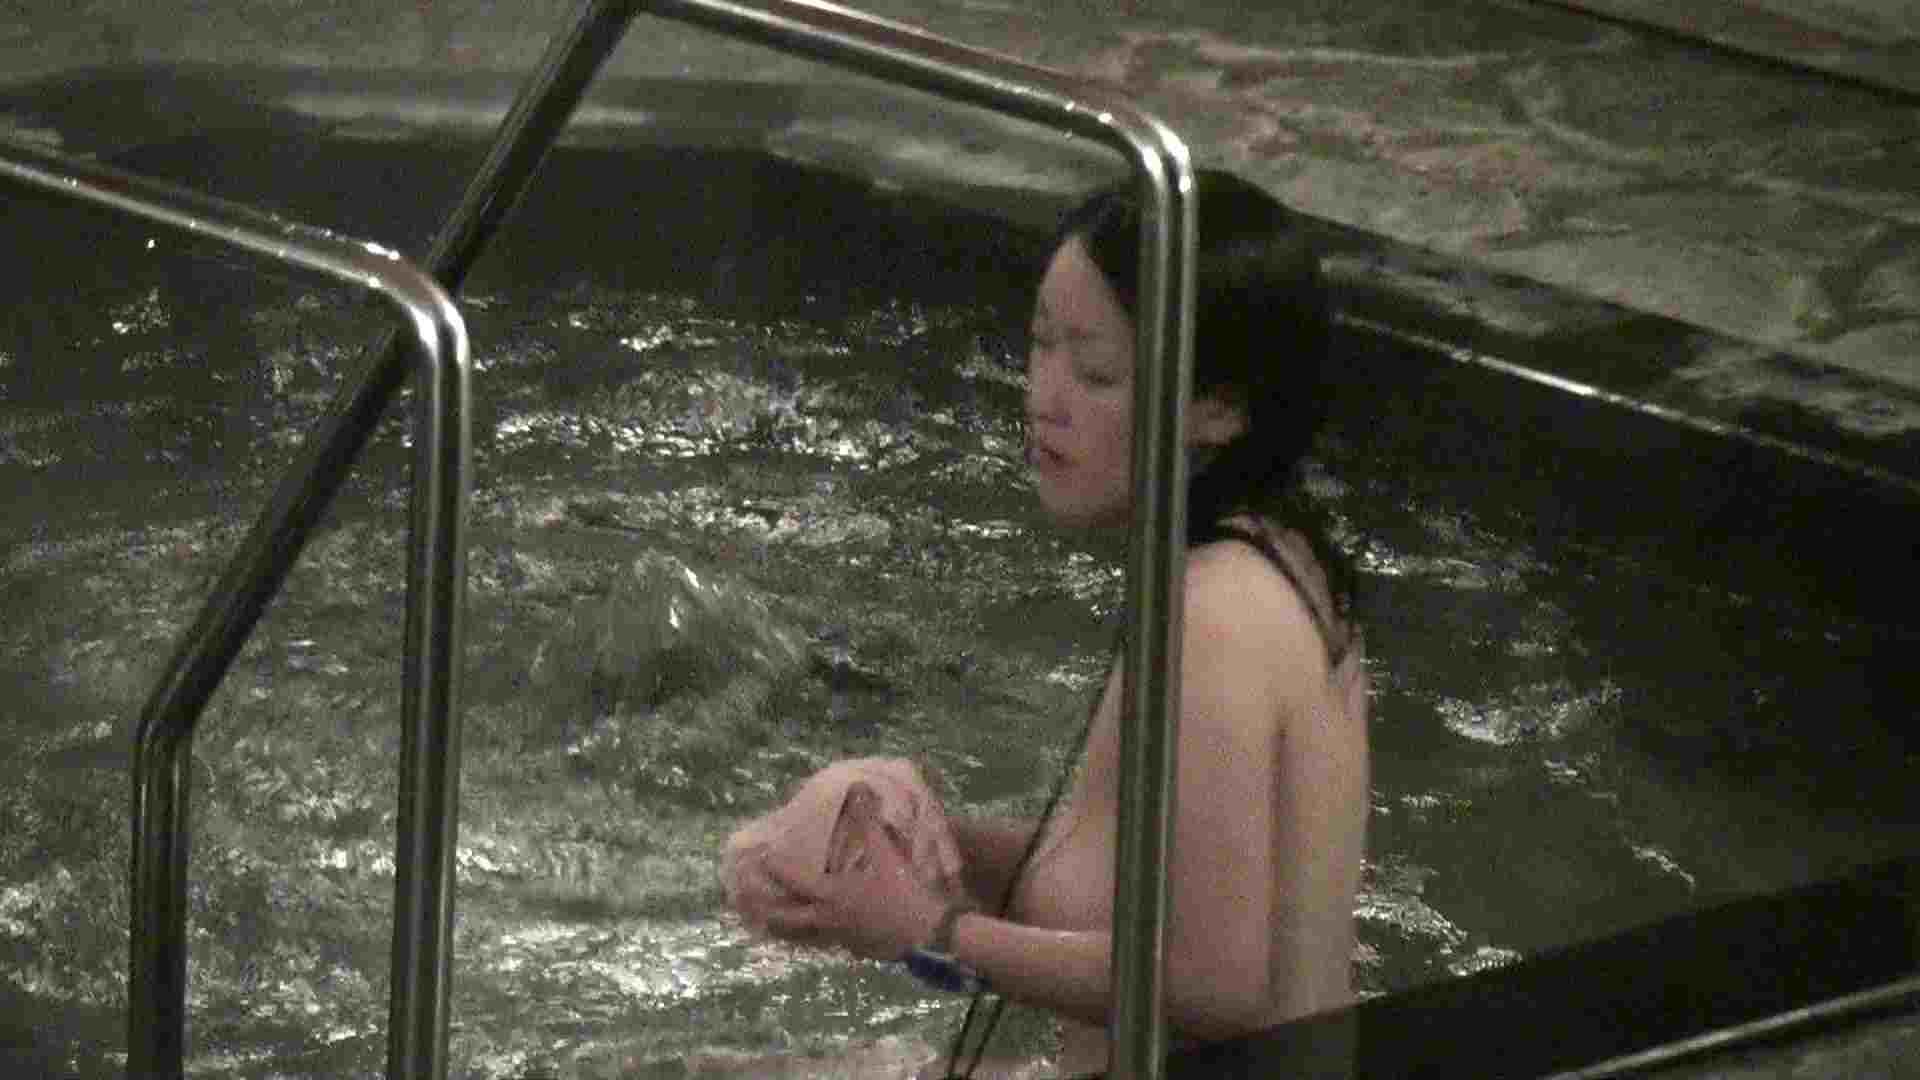 Aquaな露天風呂Vol.414 盗撮師作品  75pic 33